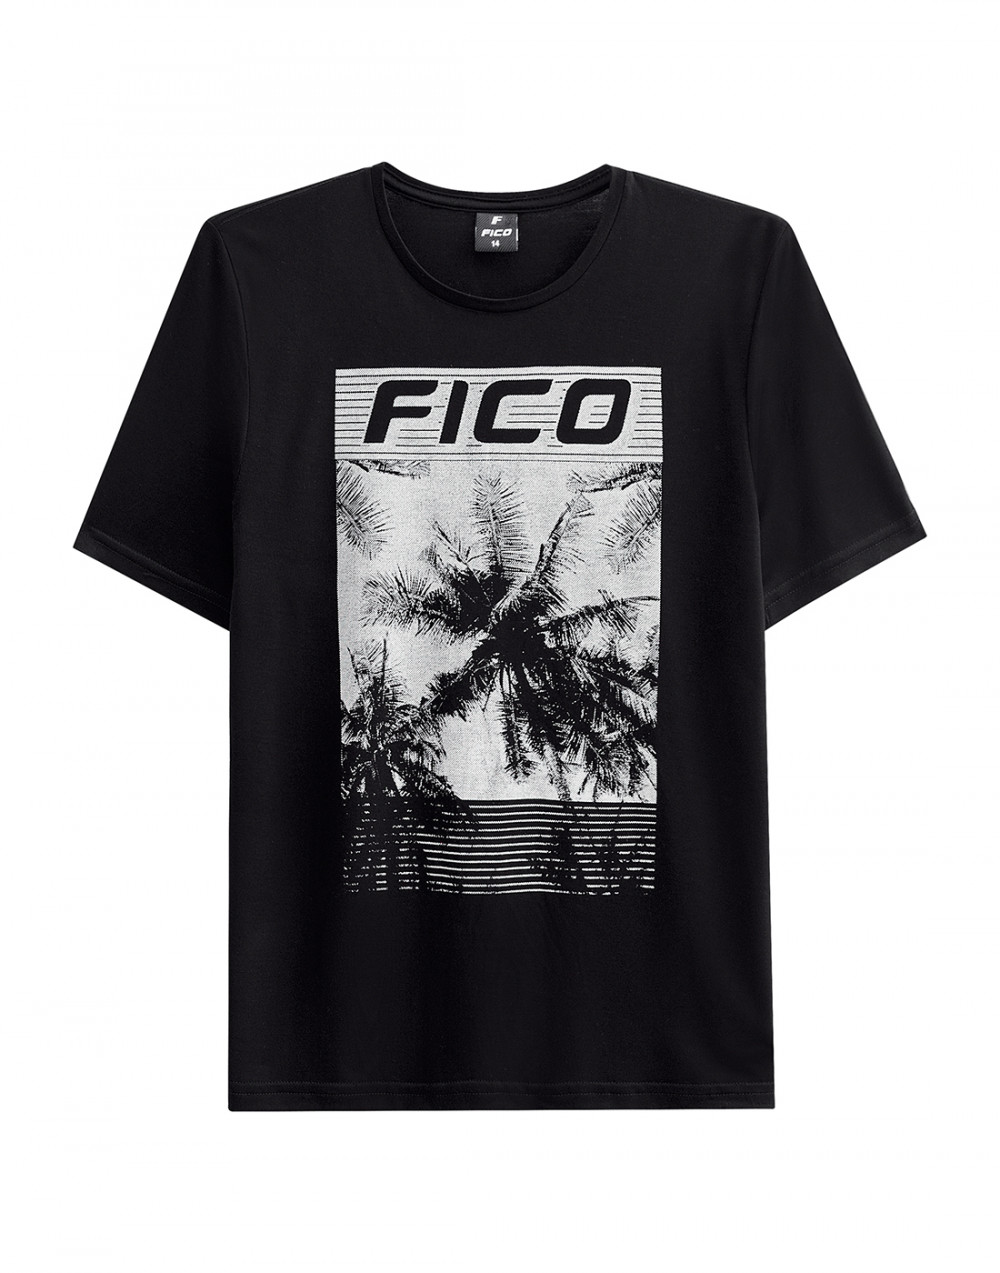 Camiseta Malha New Silk Touch Juvenil Preto Fico